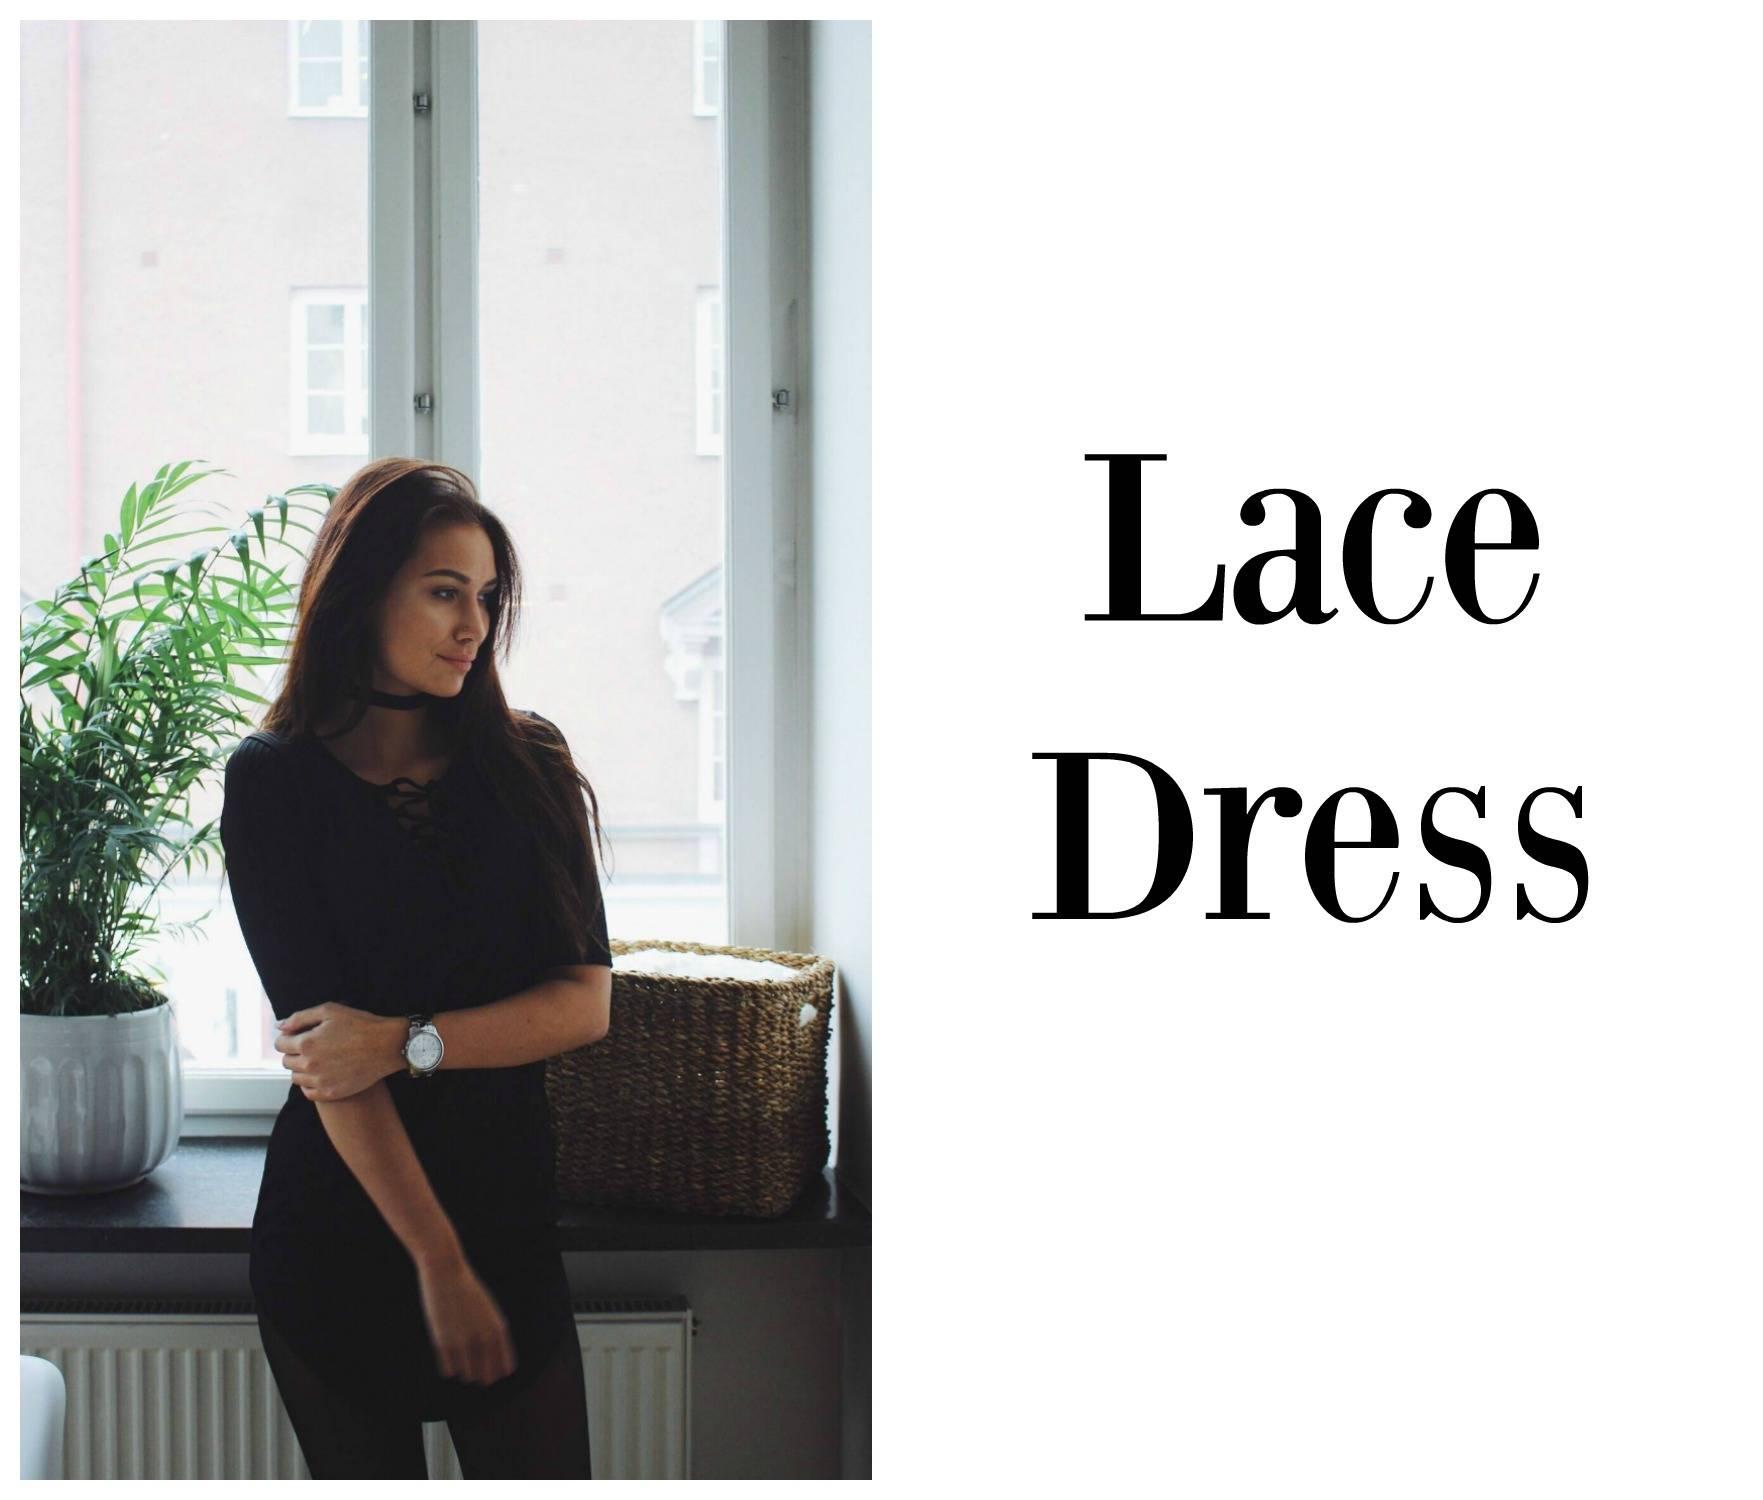 lacedress